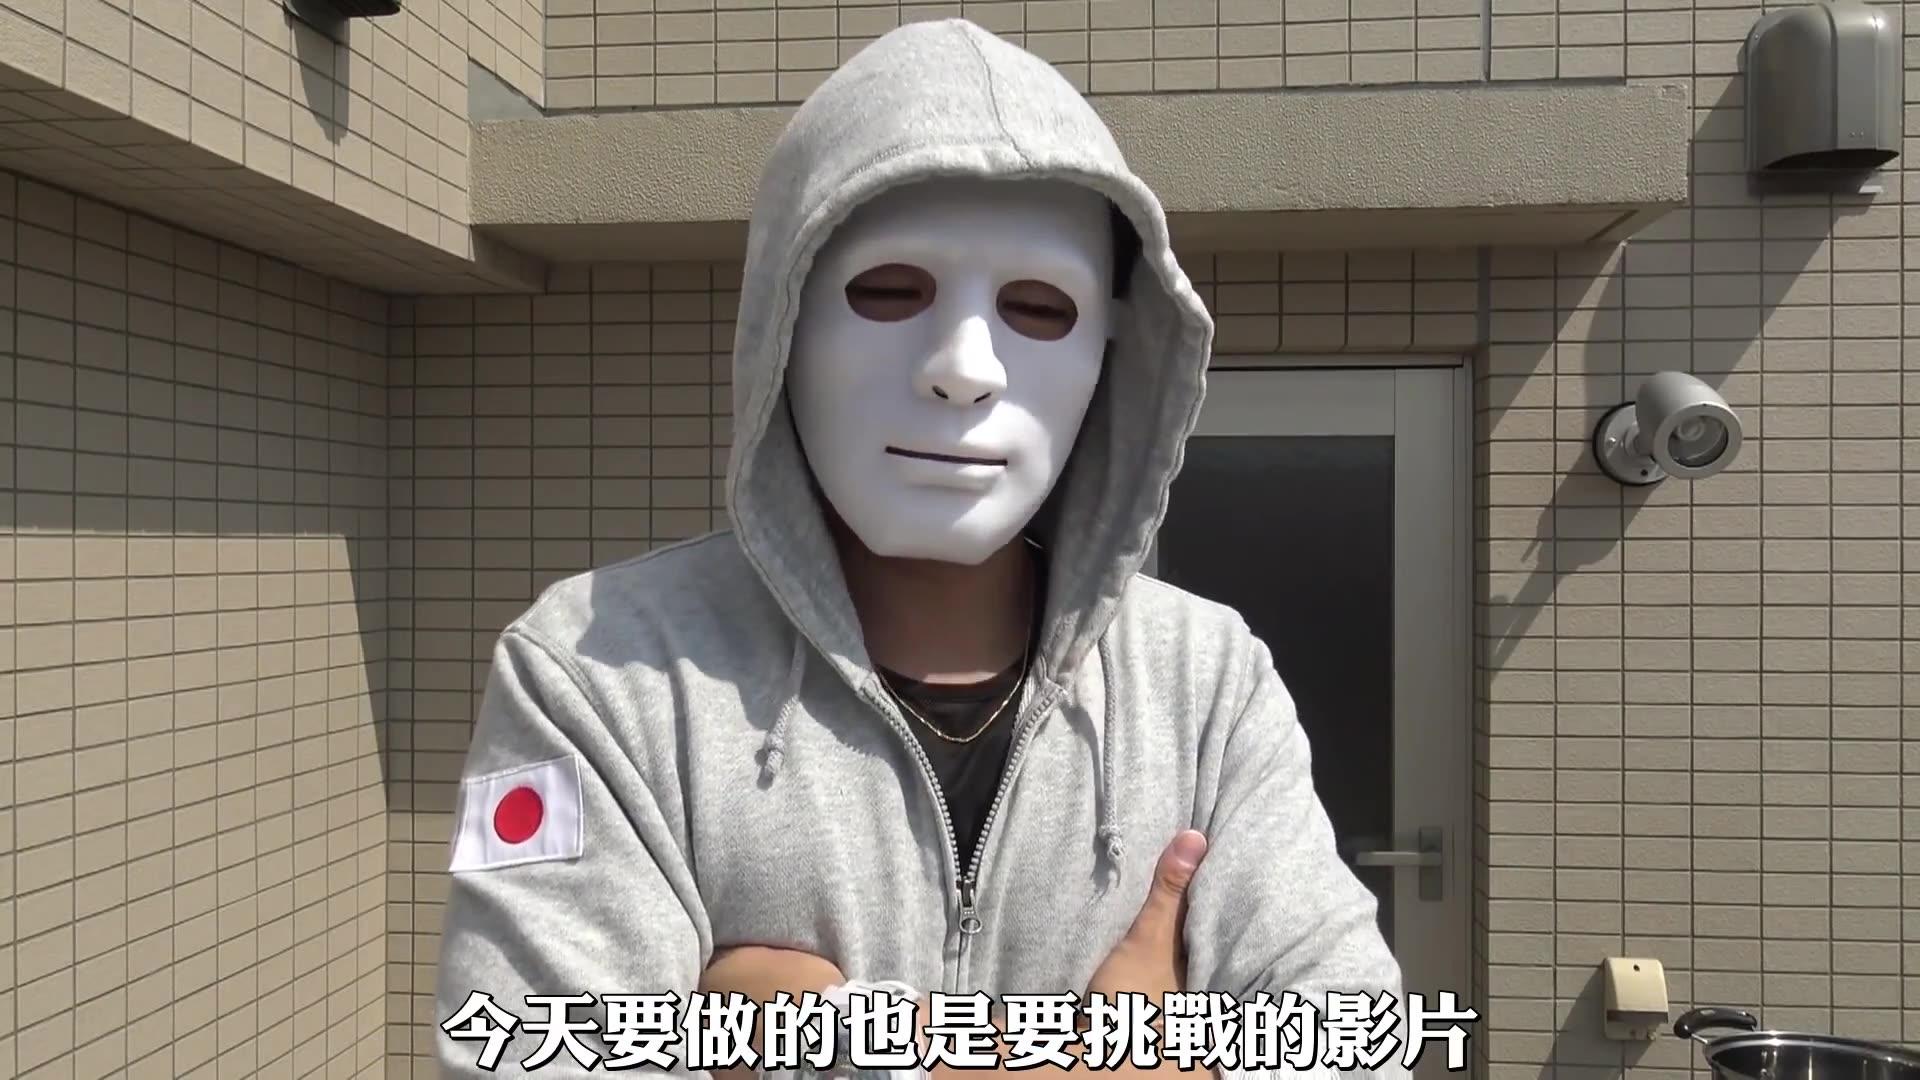 youtube拉斐爾長什么樣-youtube拉斐爾帥不帥-youtube拉斐爾的真面目-youtube拉斐爾照片-日本youtuber拉斐爾-youtuber拉斐爾真人